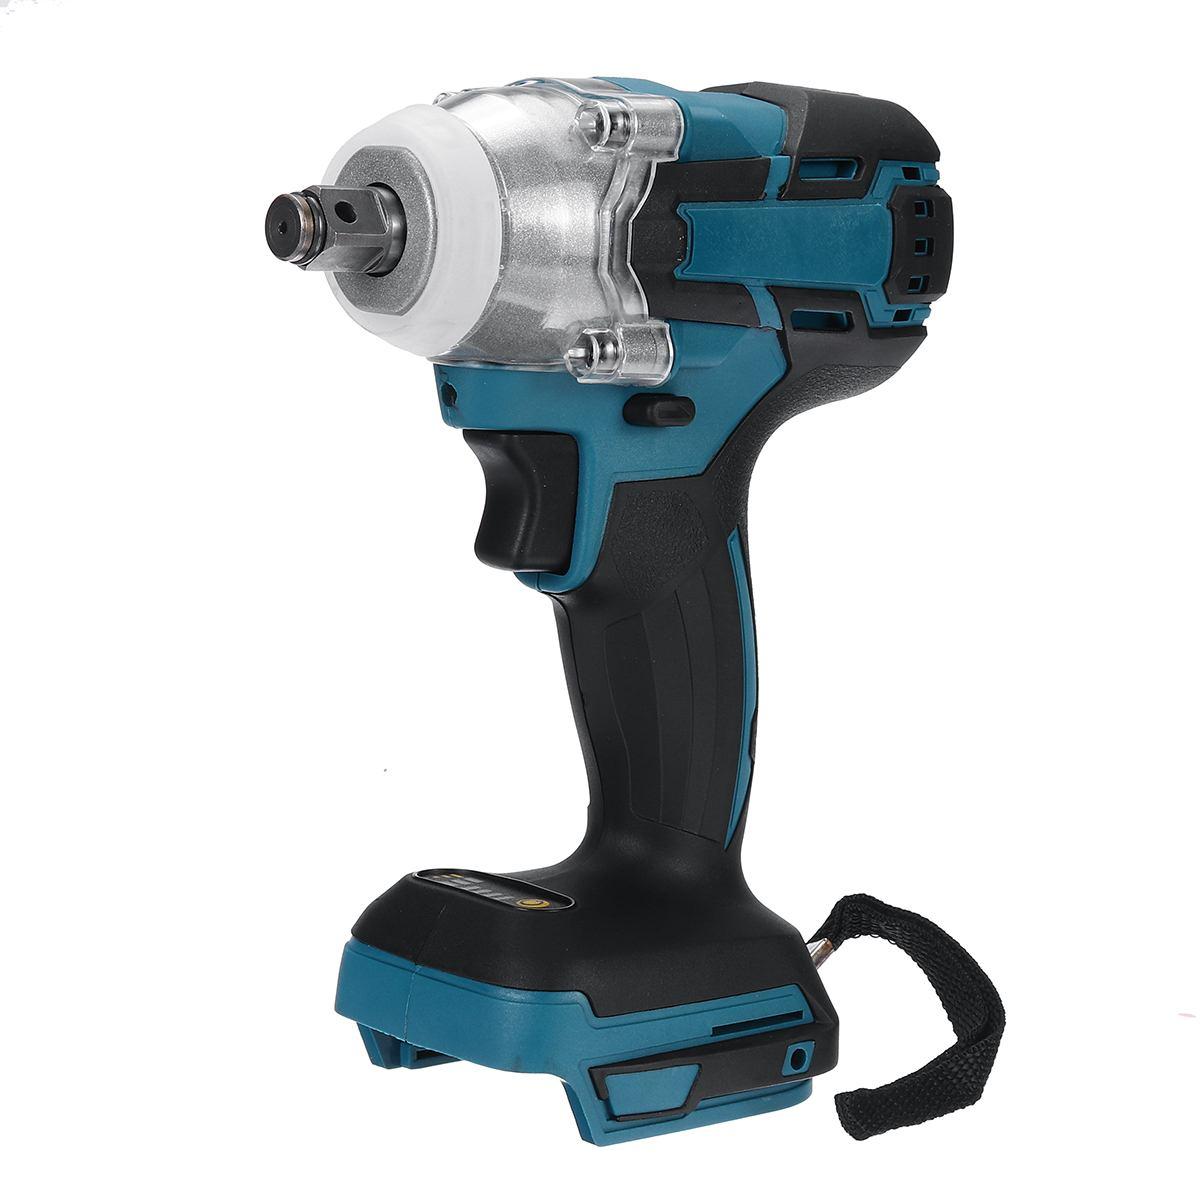 18V 280Nm Cordless Impact Wrench Driver Brushless Motor 1/2